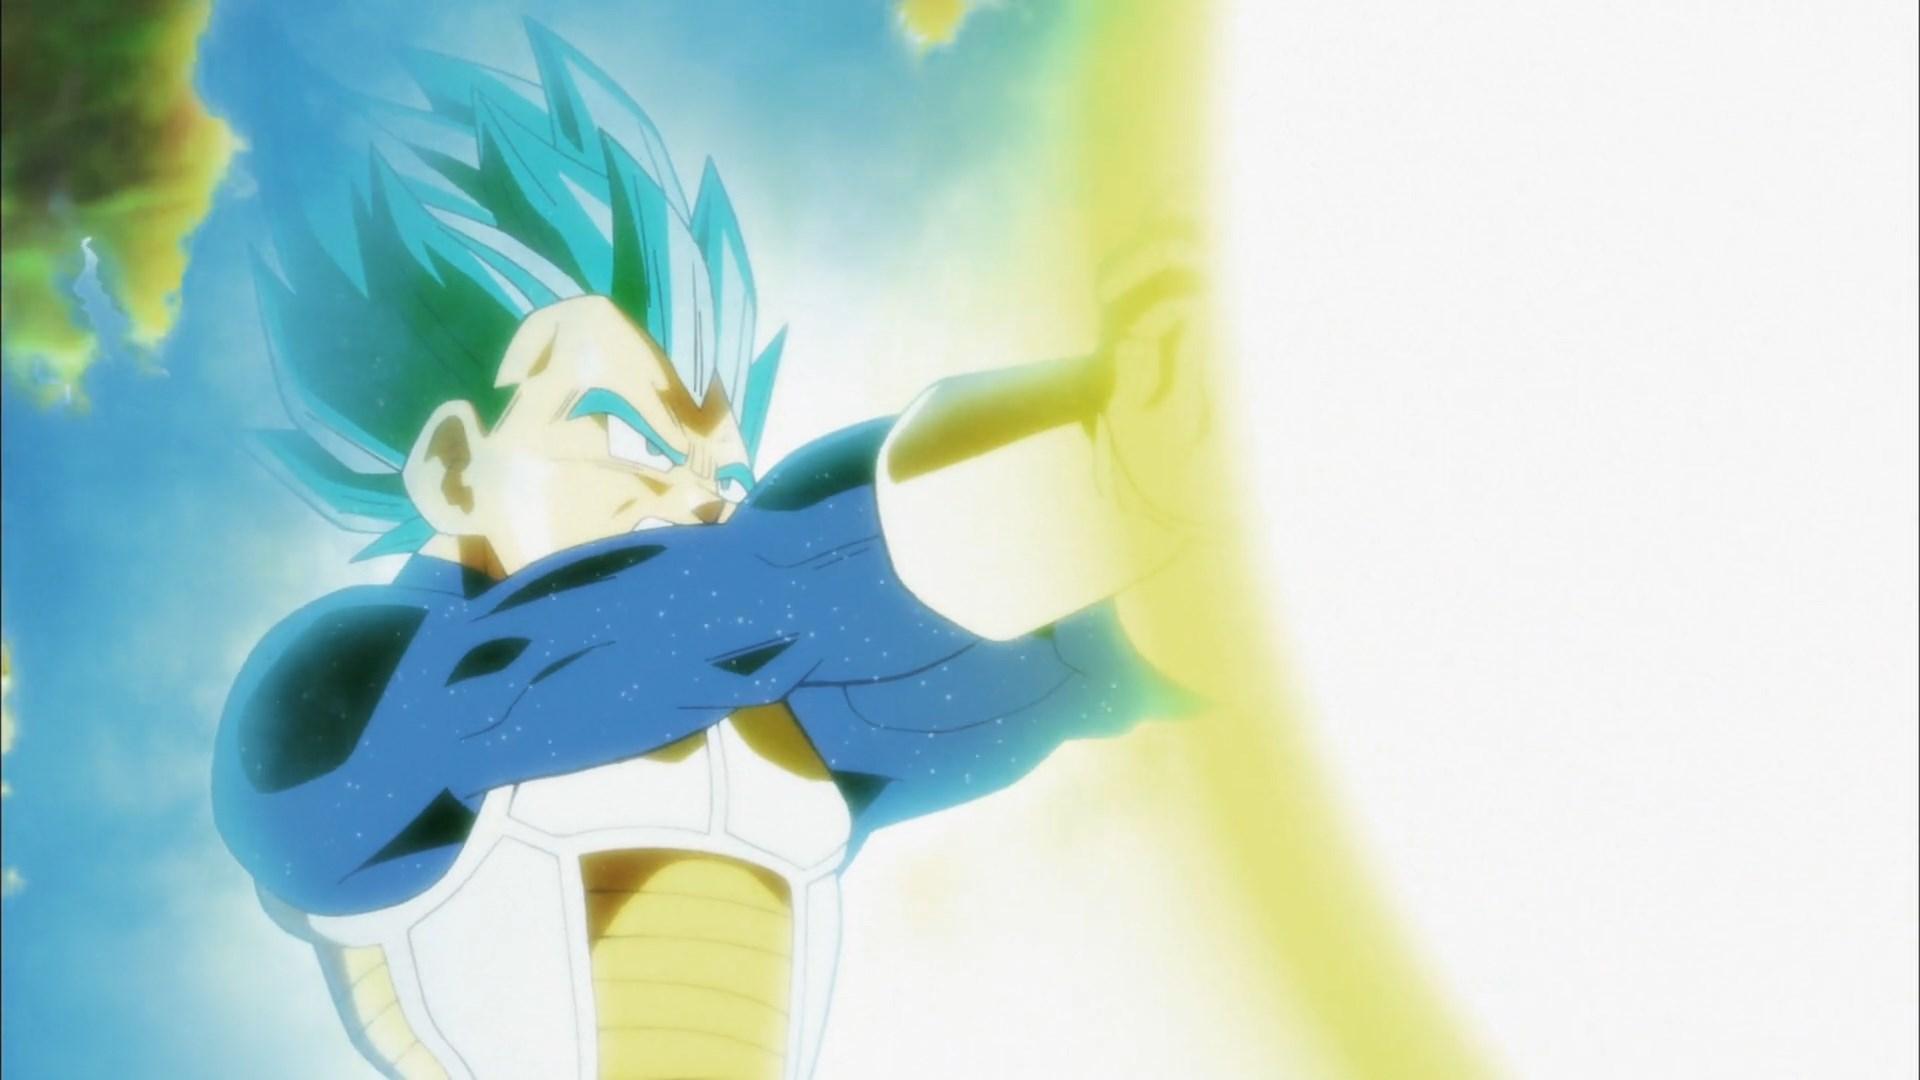 [HorribleSubs] Dragon Ball Super - 121 [1080p].mkv_snapshot_17.14